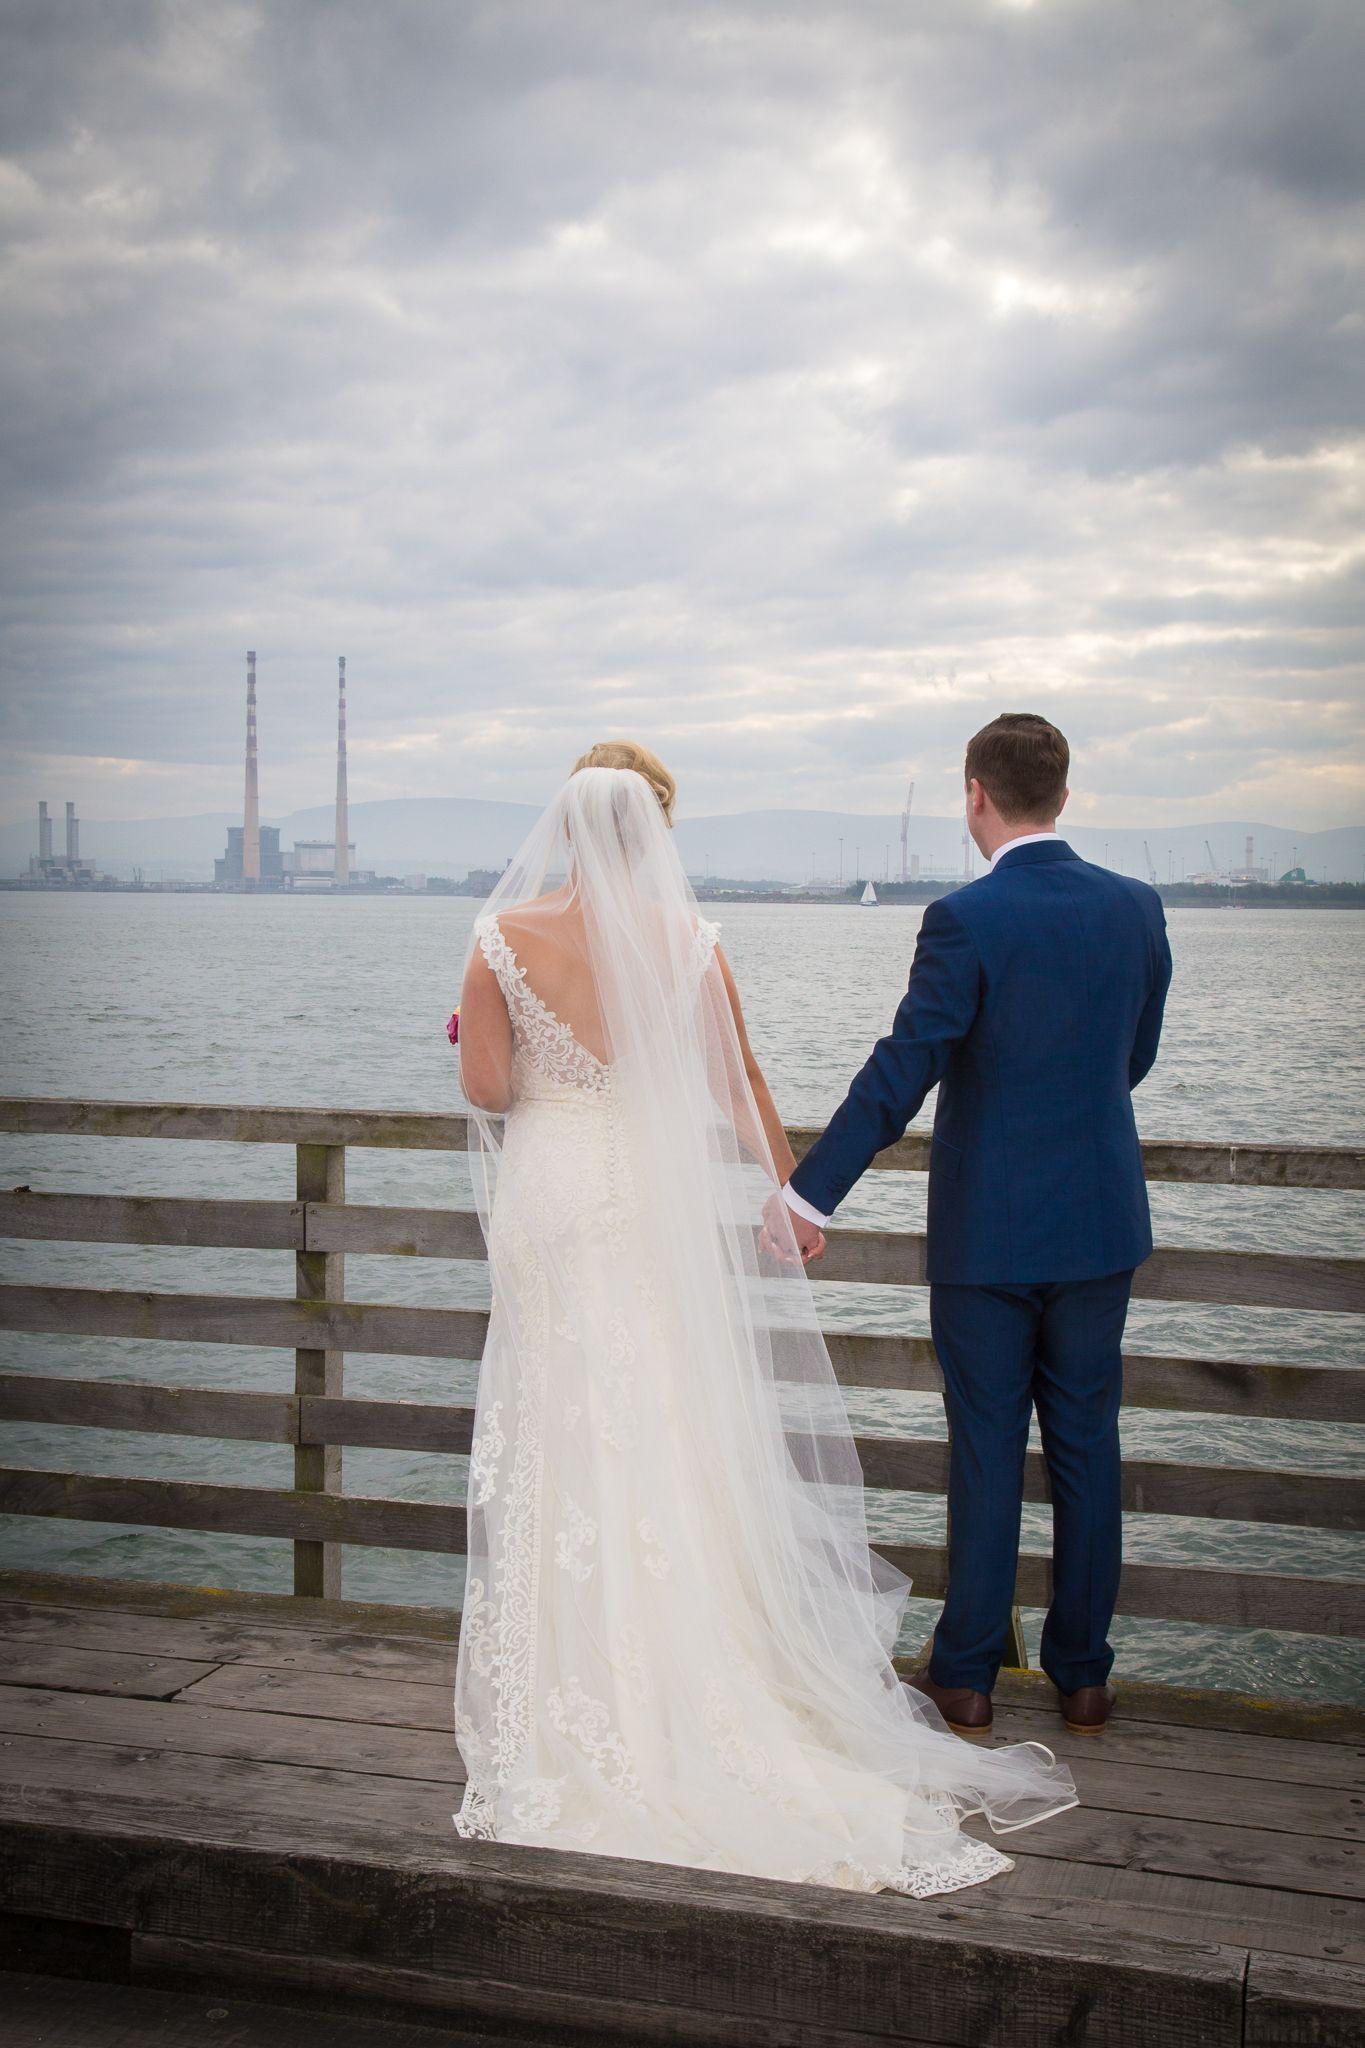 Bull Island Bridge Wedding Couple Before heading